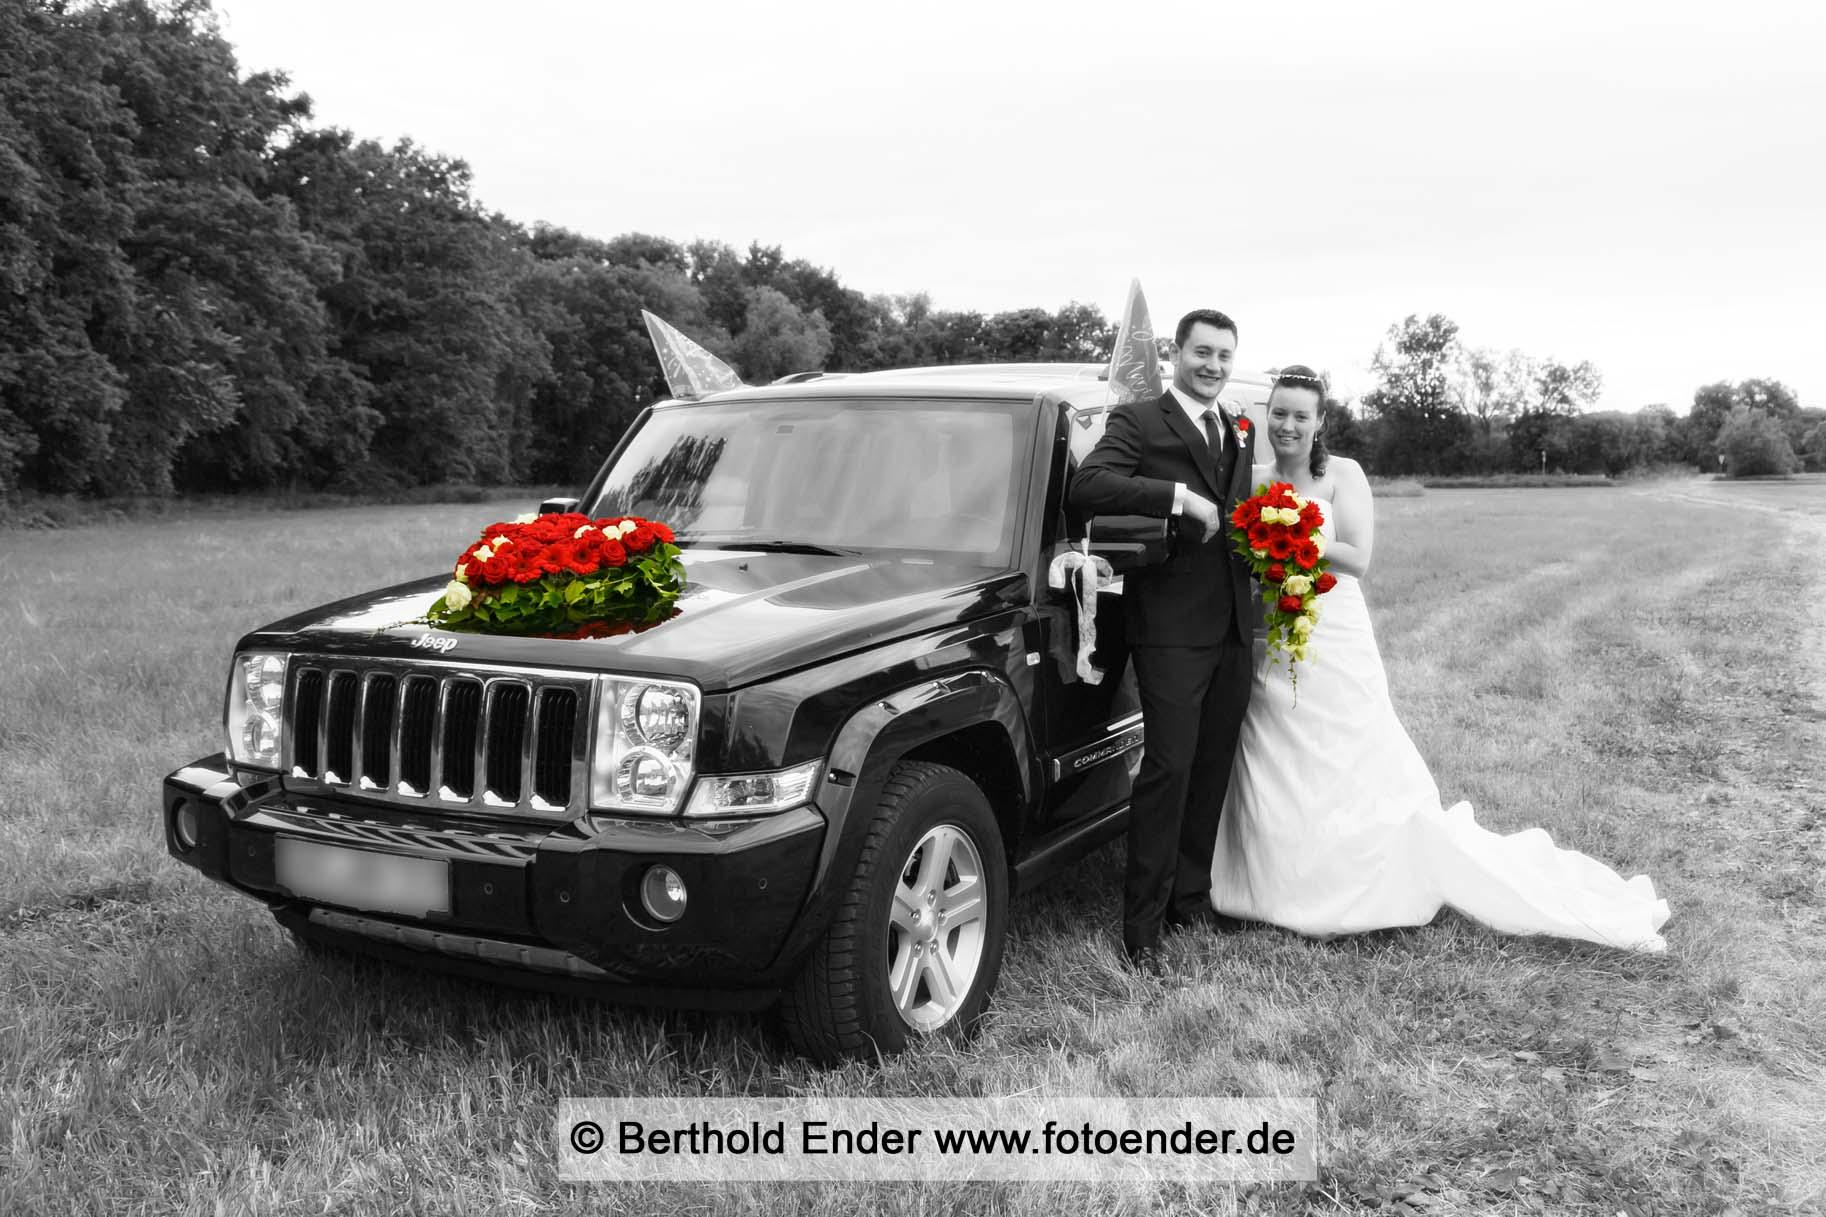 Brautpaar Shooting im Wörlitzer Park, Fotostudio Ender